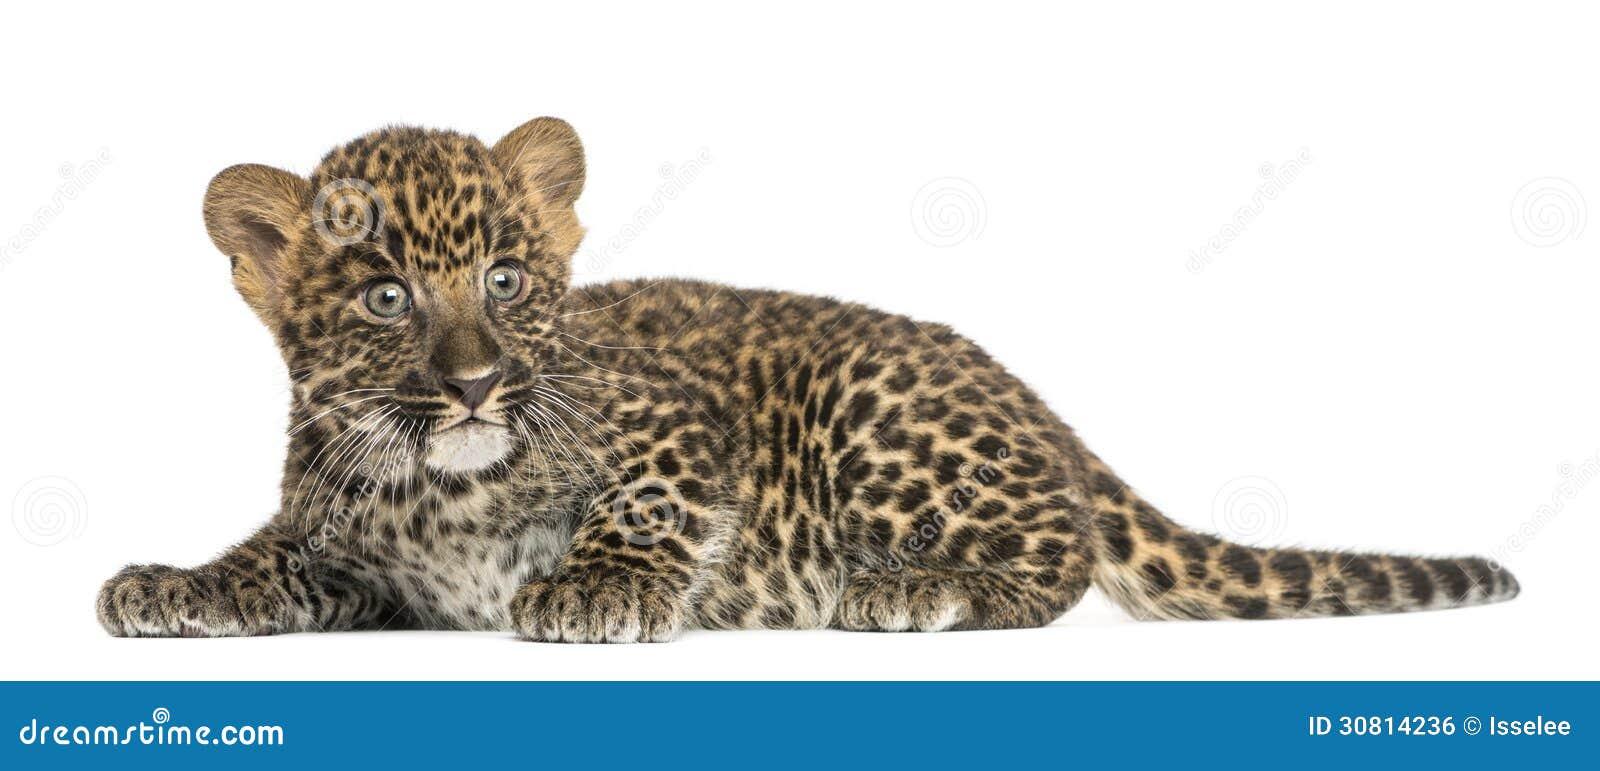 Beschmutztes Leopardjunges, das unten - Panthera pardus, 7 Wochen alt liegt